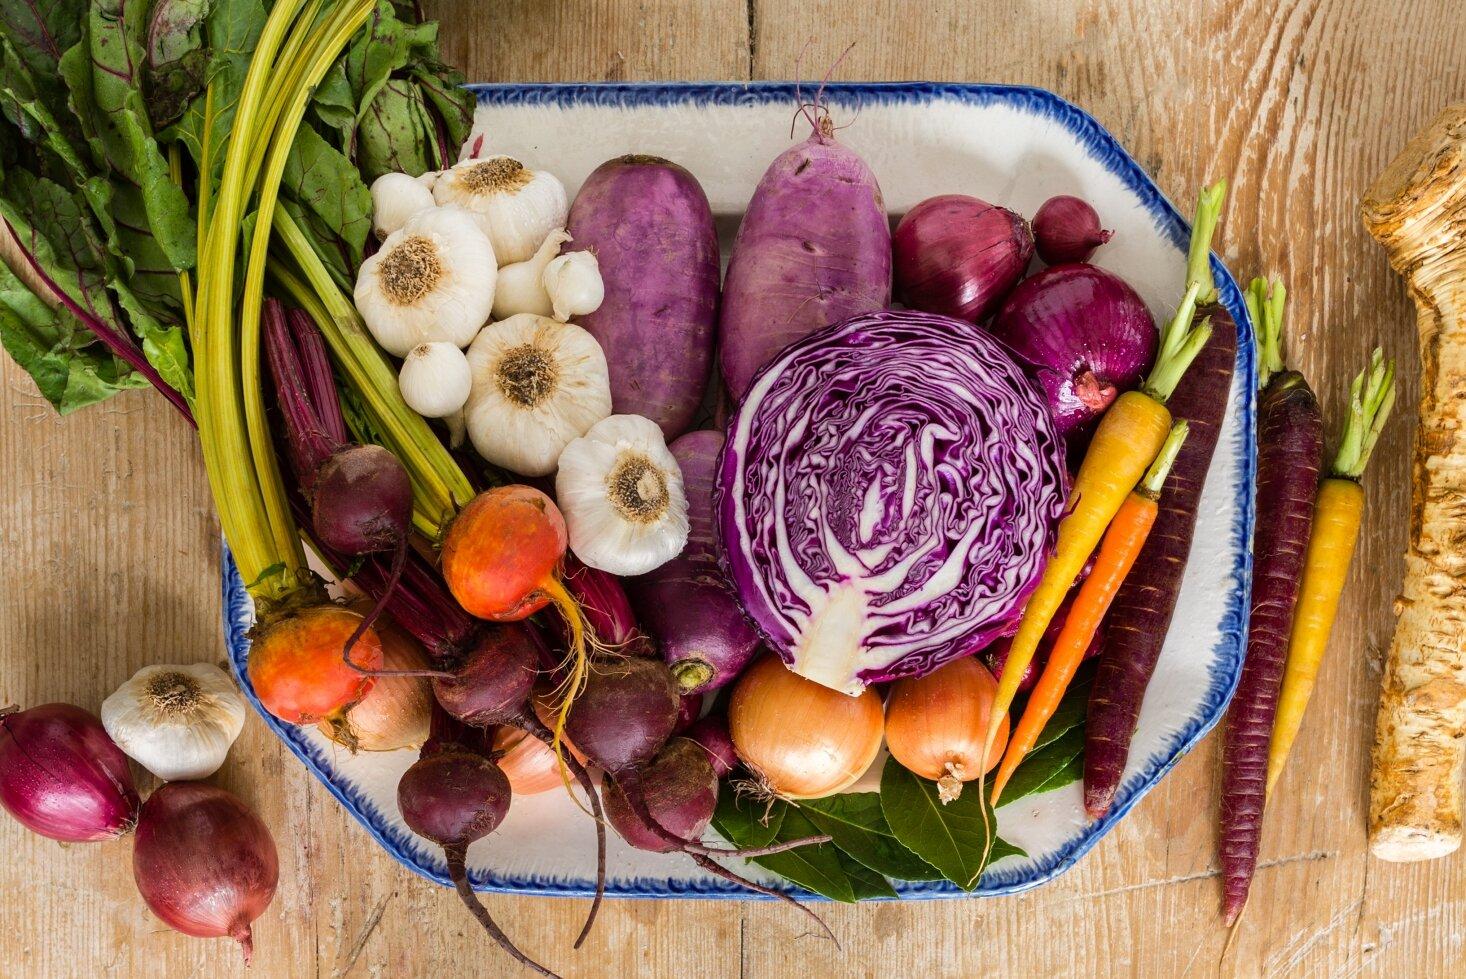 cabbage-beets-garlic-carrots-onions-marta-xochilt-perez-1466x979.jpg